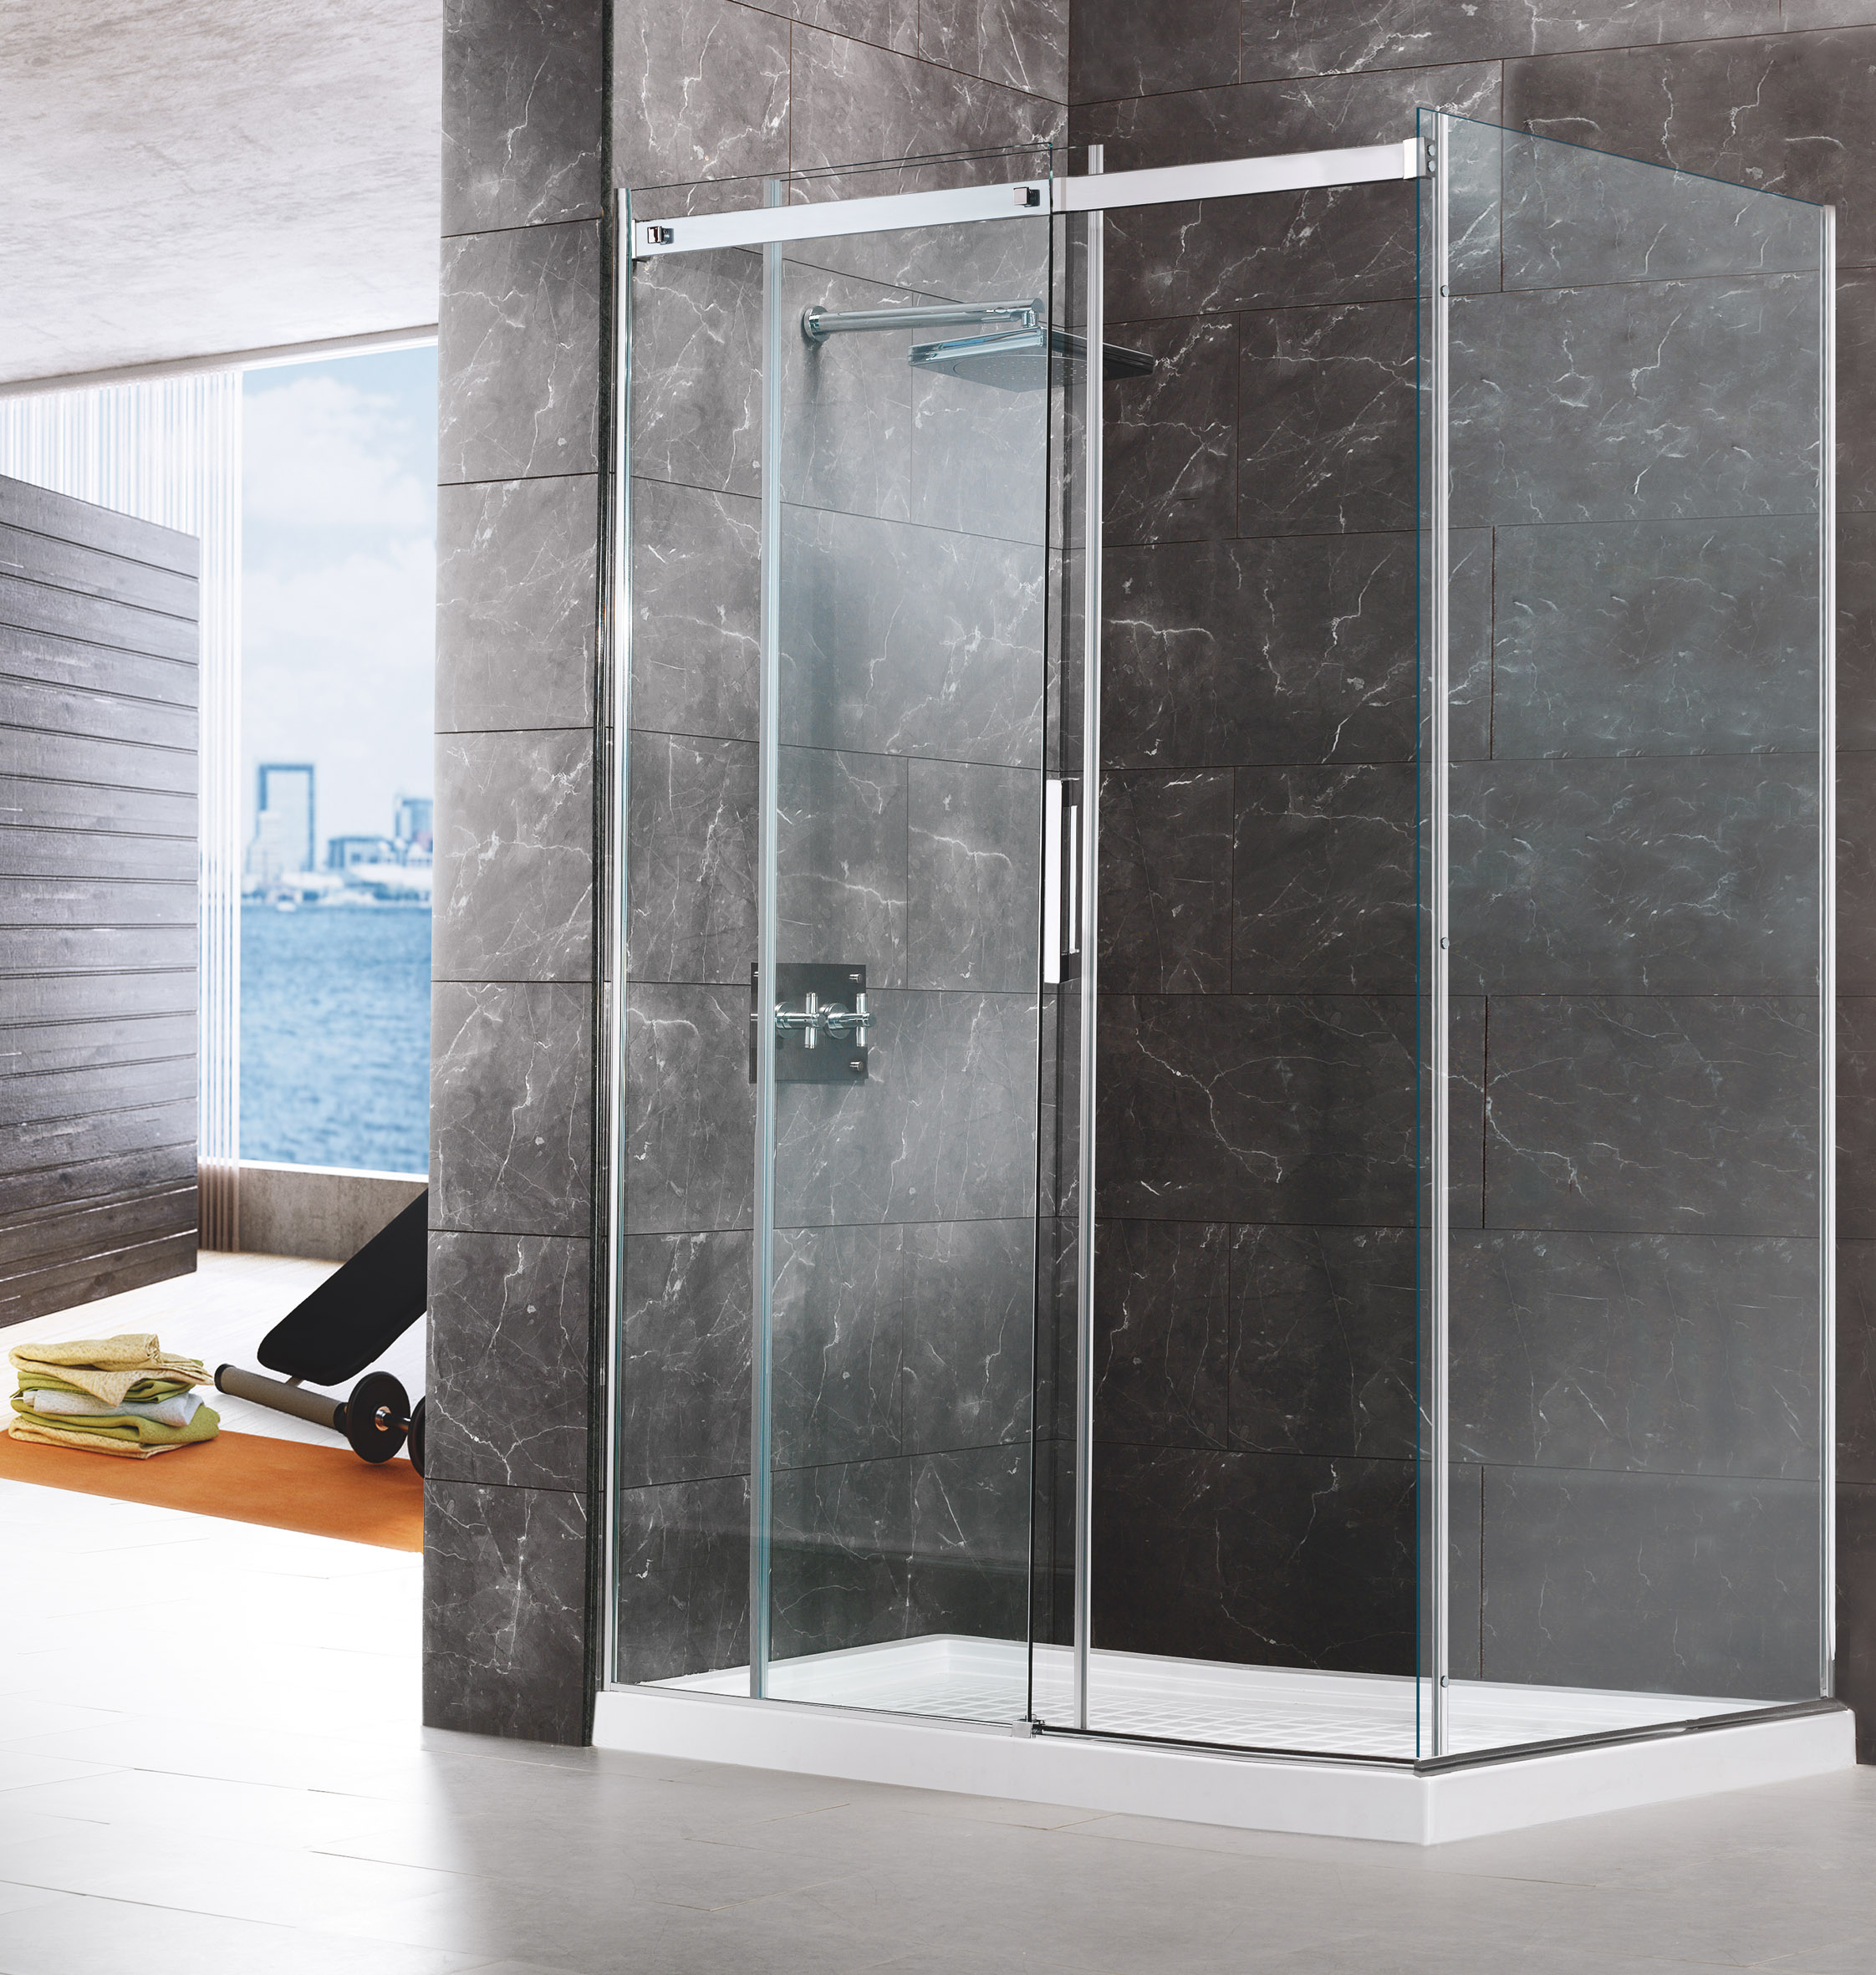 Mamparas de ducha madrid beautiful aluminios alcorcon for Puertas ratoncito perez baratas